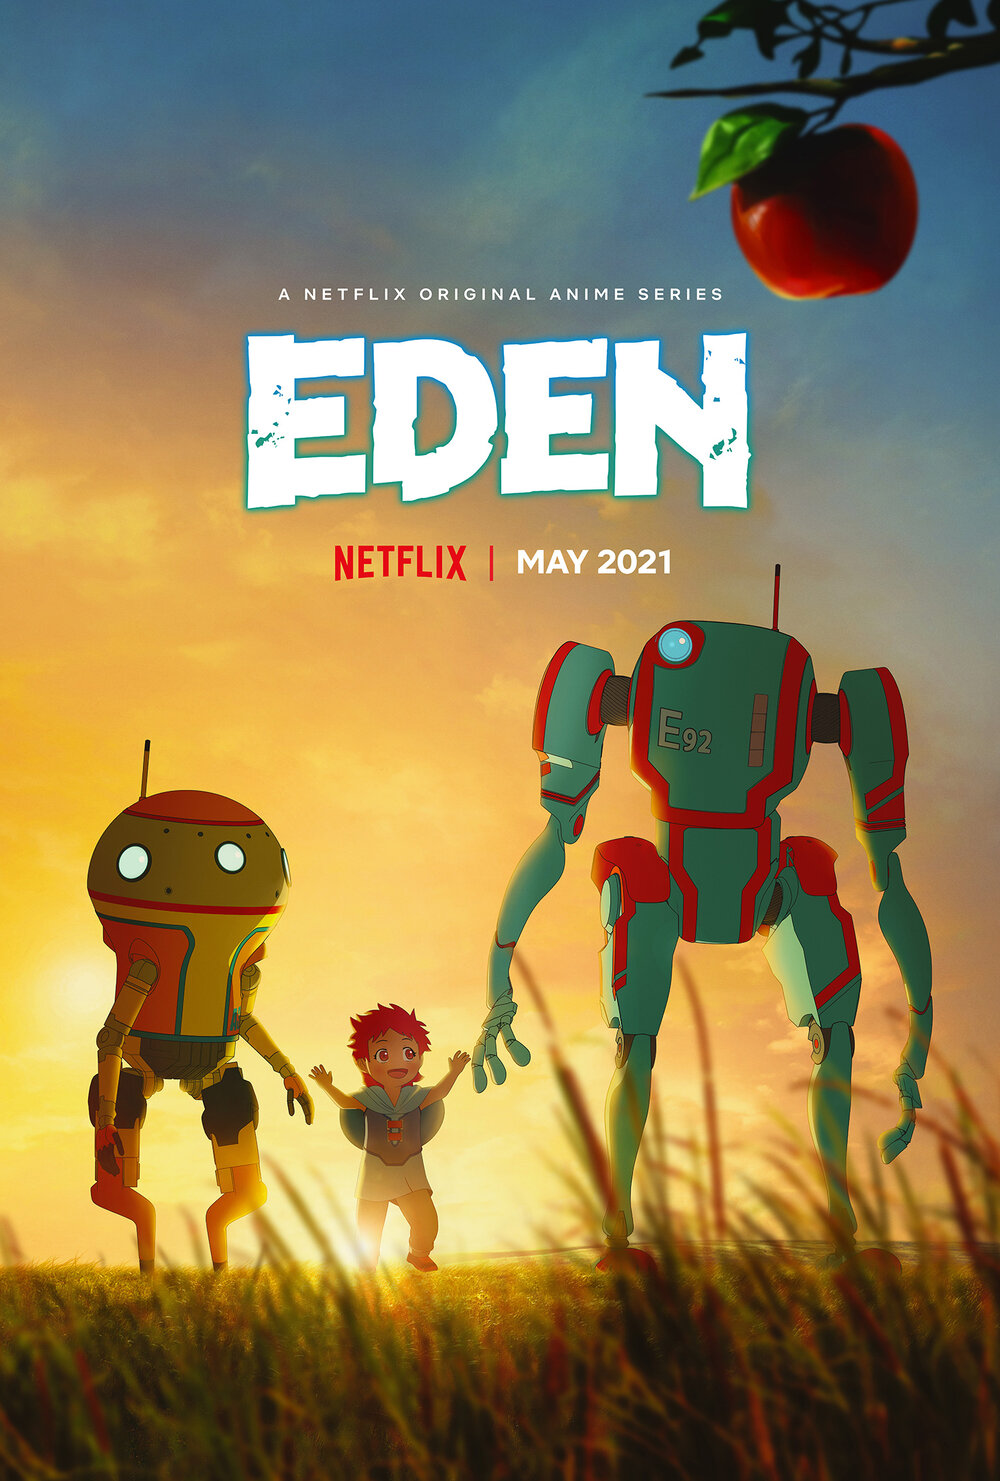 fantastic-first-trailer-for-netflixs-robot-anime-series-eden1